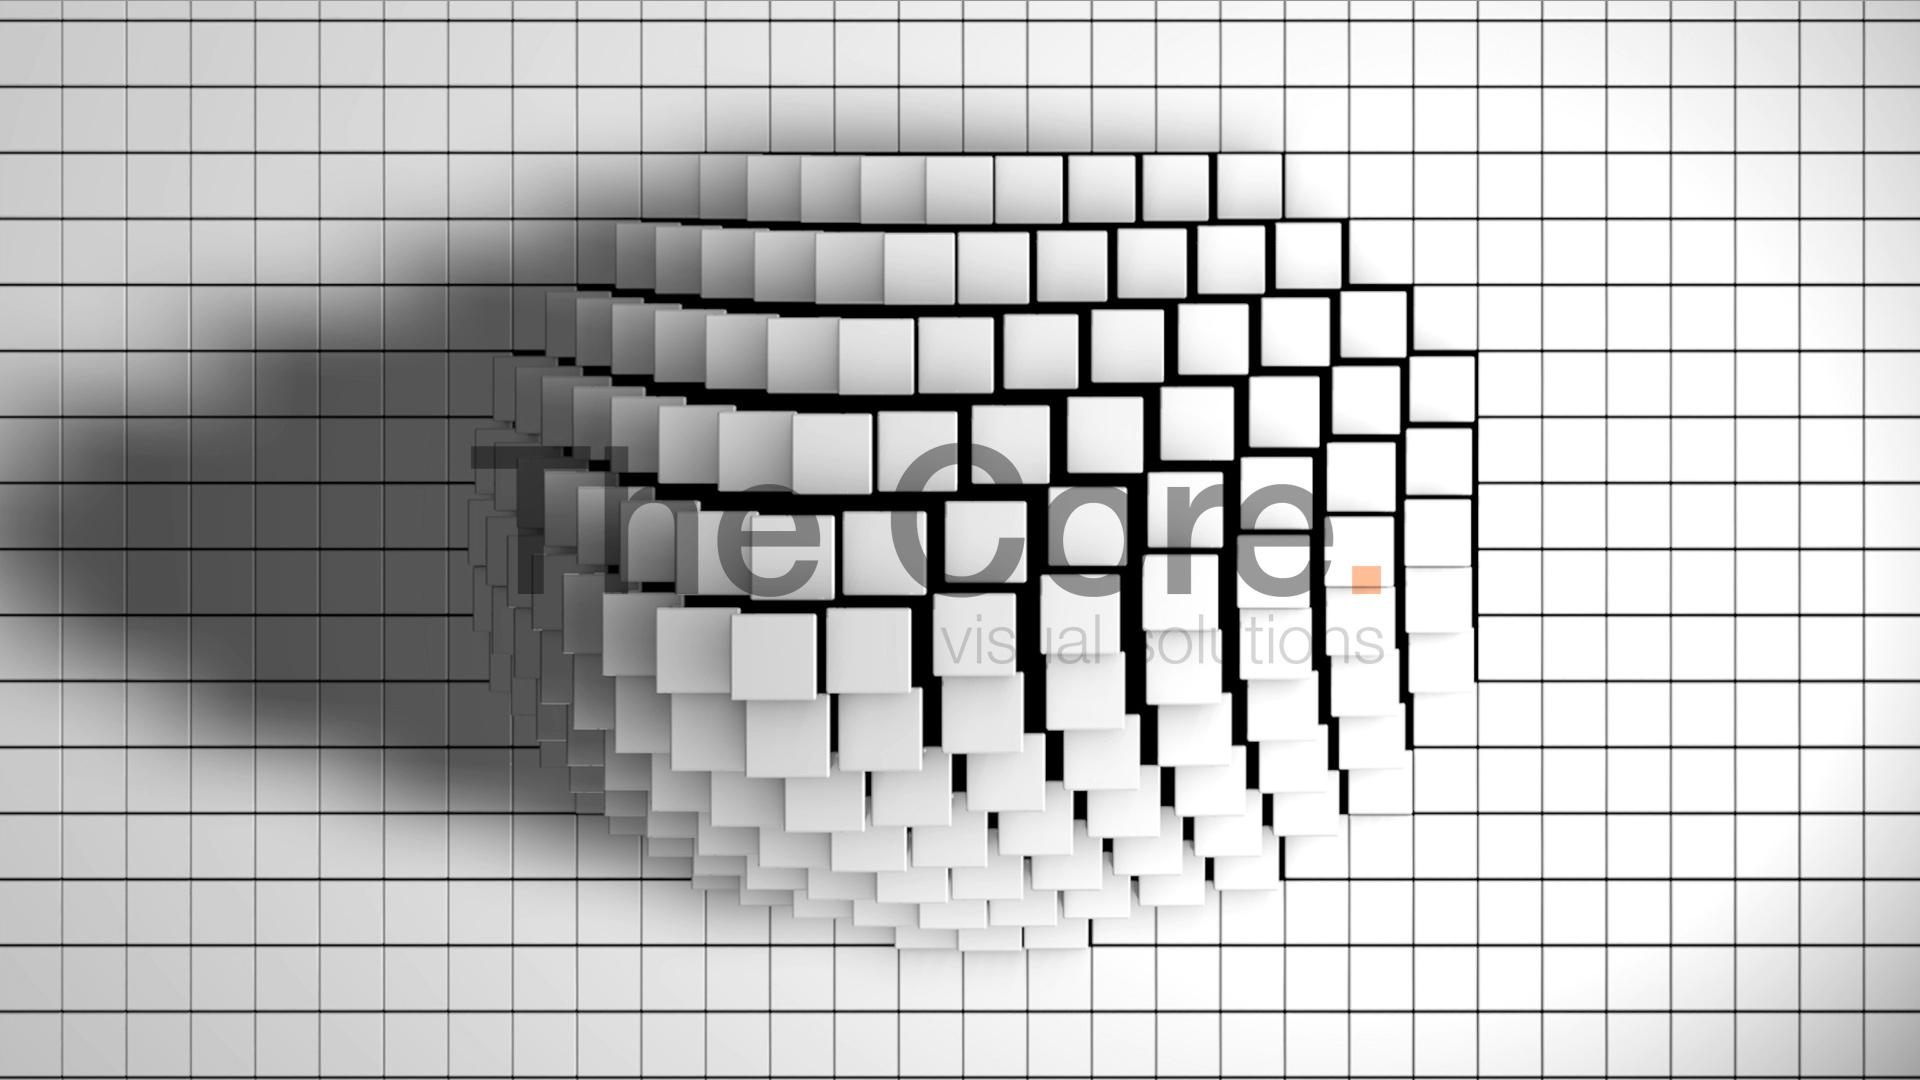 00311-KUBUS-PUMP-3-STILL-by-The-Core